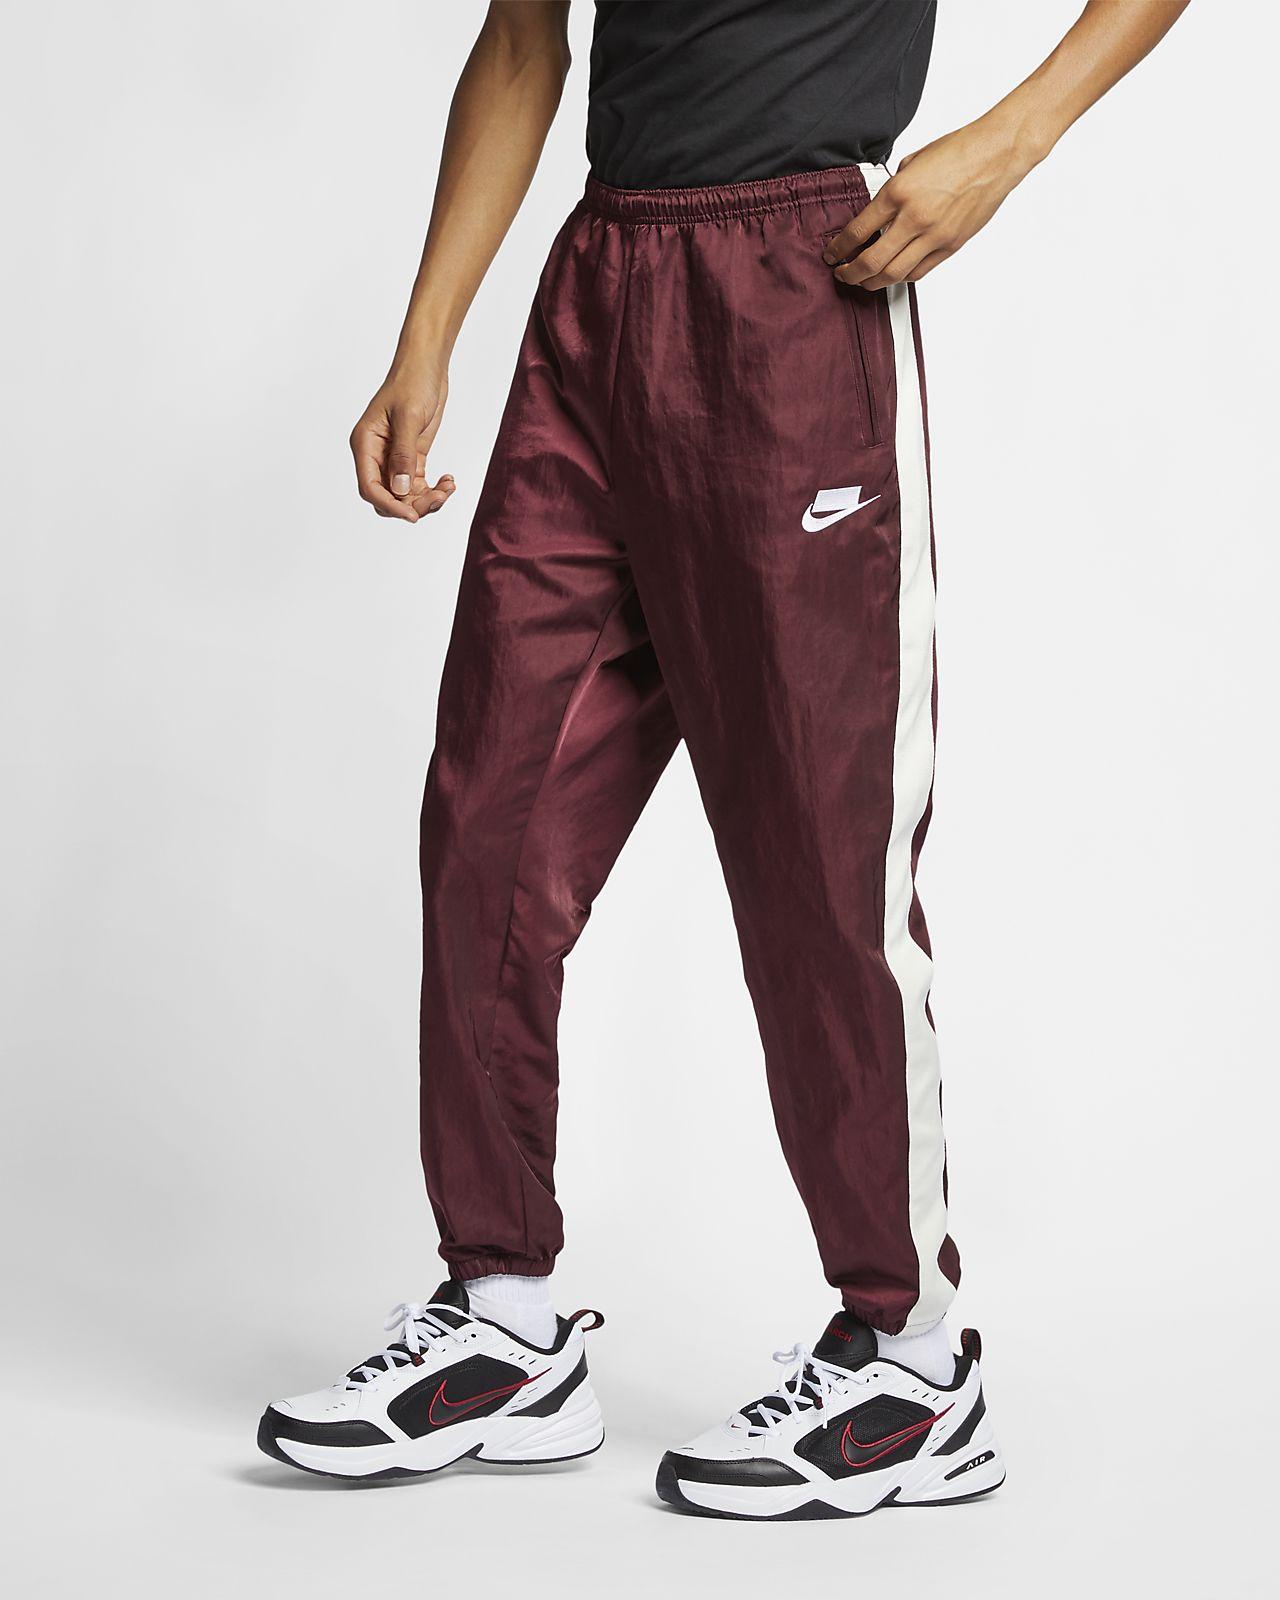 73b7d951b46c67 Nike Sportswear NSW Men s Woven Trousers. Nike.com GB